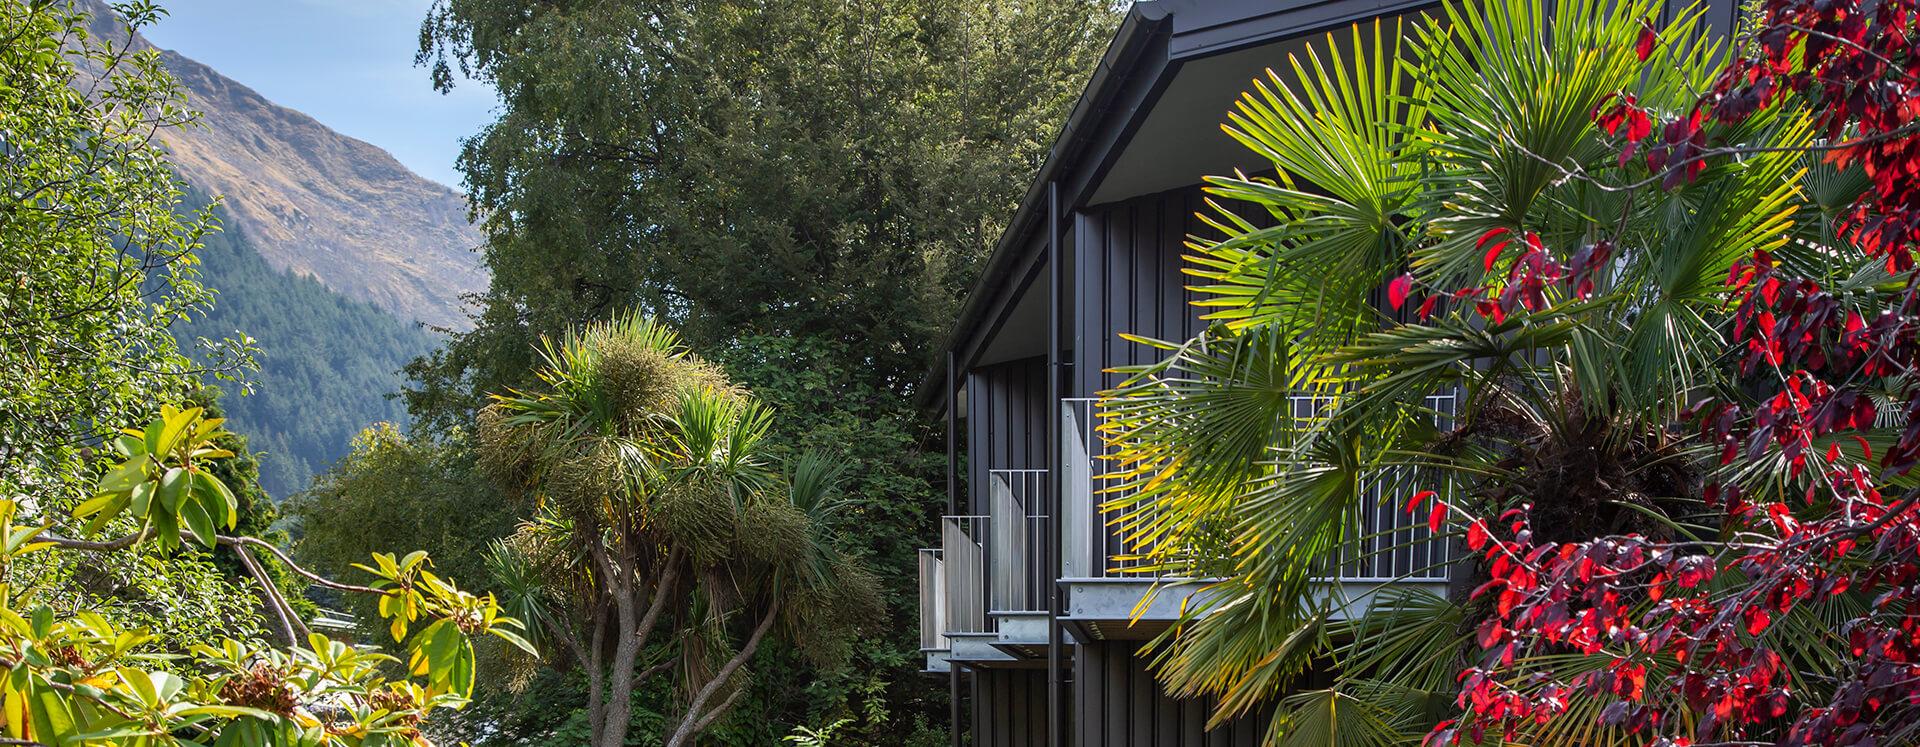 Koura Apartments garden balconies